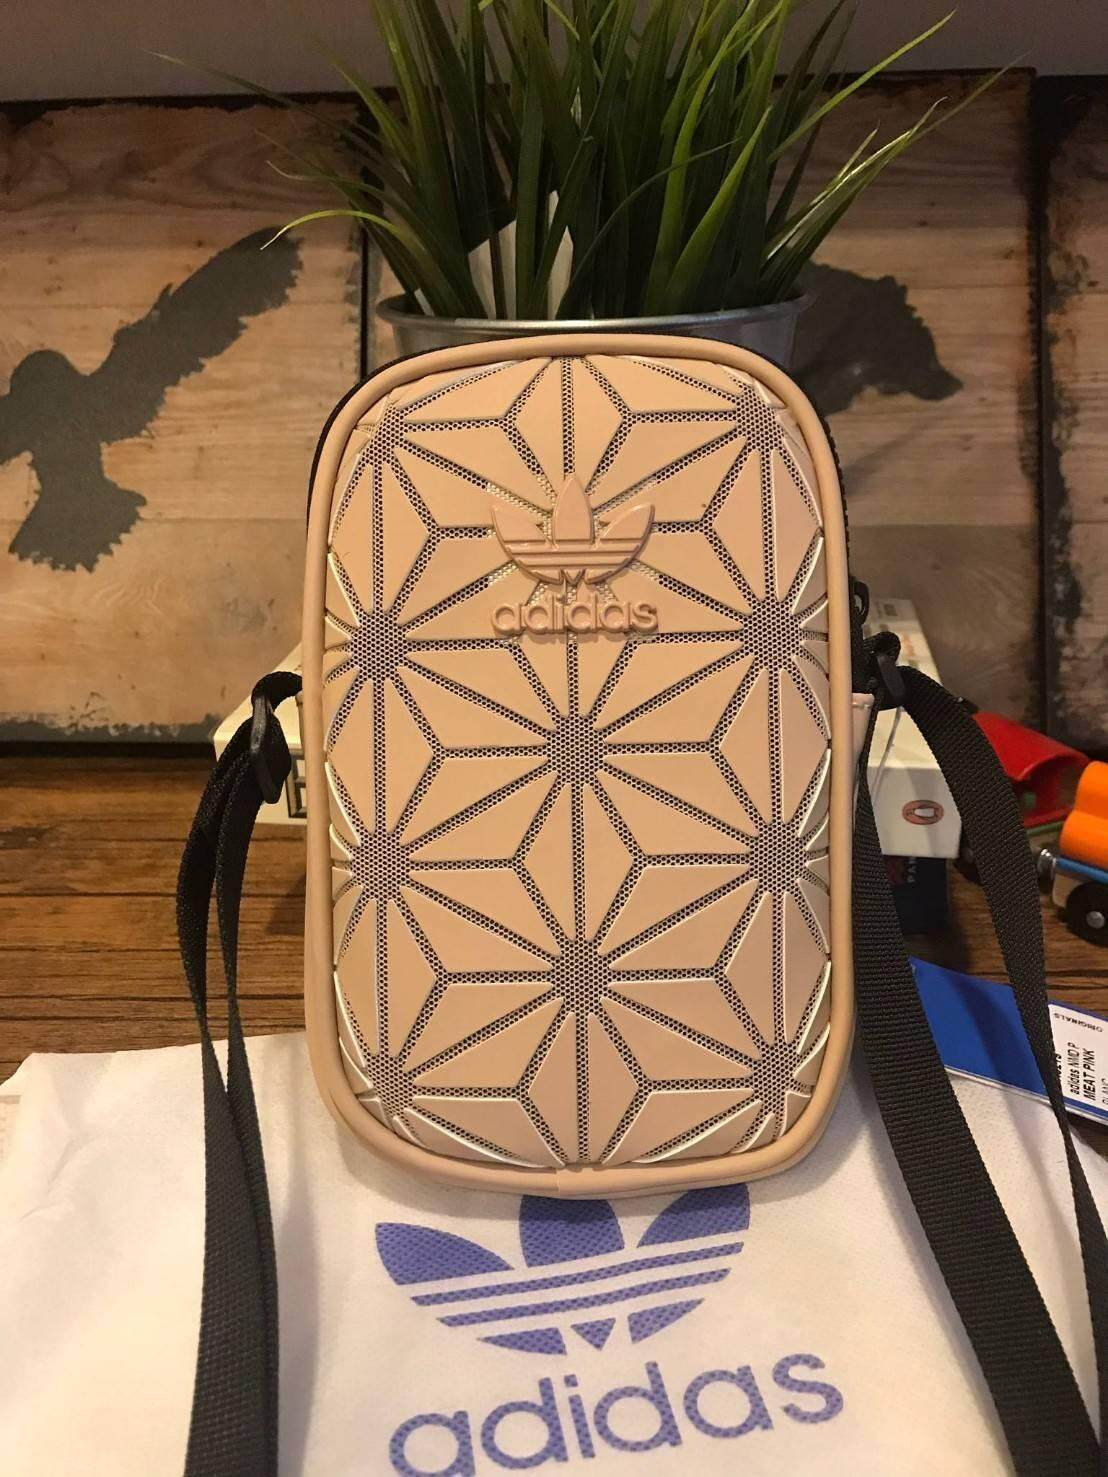 Adidas 3d airliner mini shoulder bag กระเป๋าสะพายรุ่นใหม่ขนาดมินิ